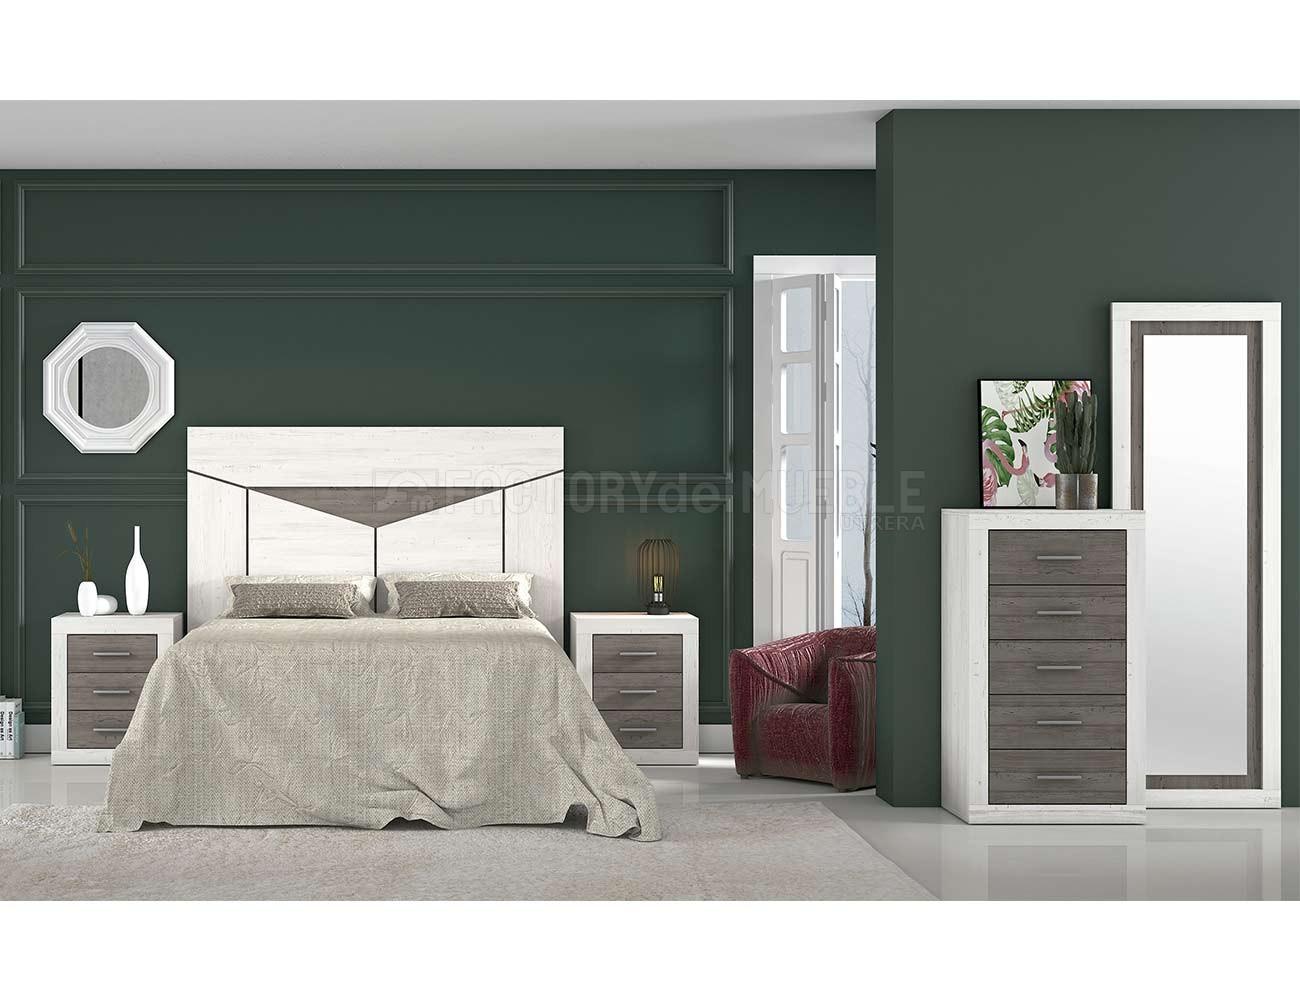 Dormitorio matrimonio moderno 401